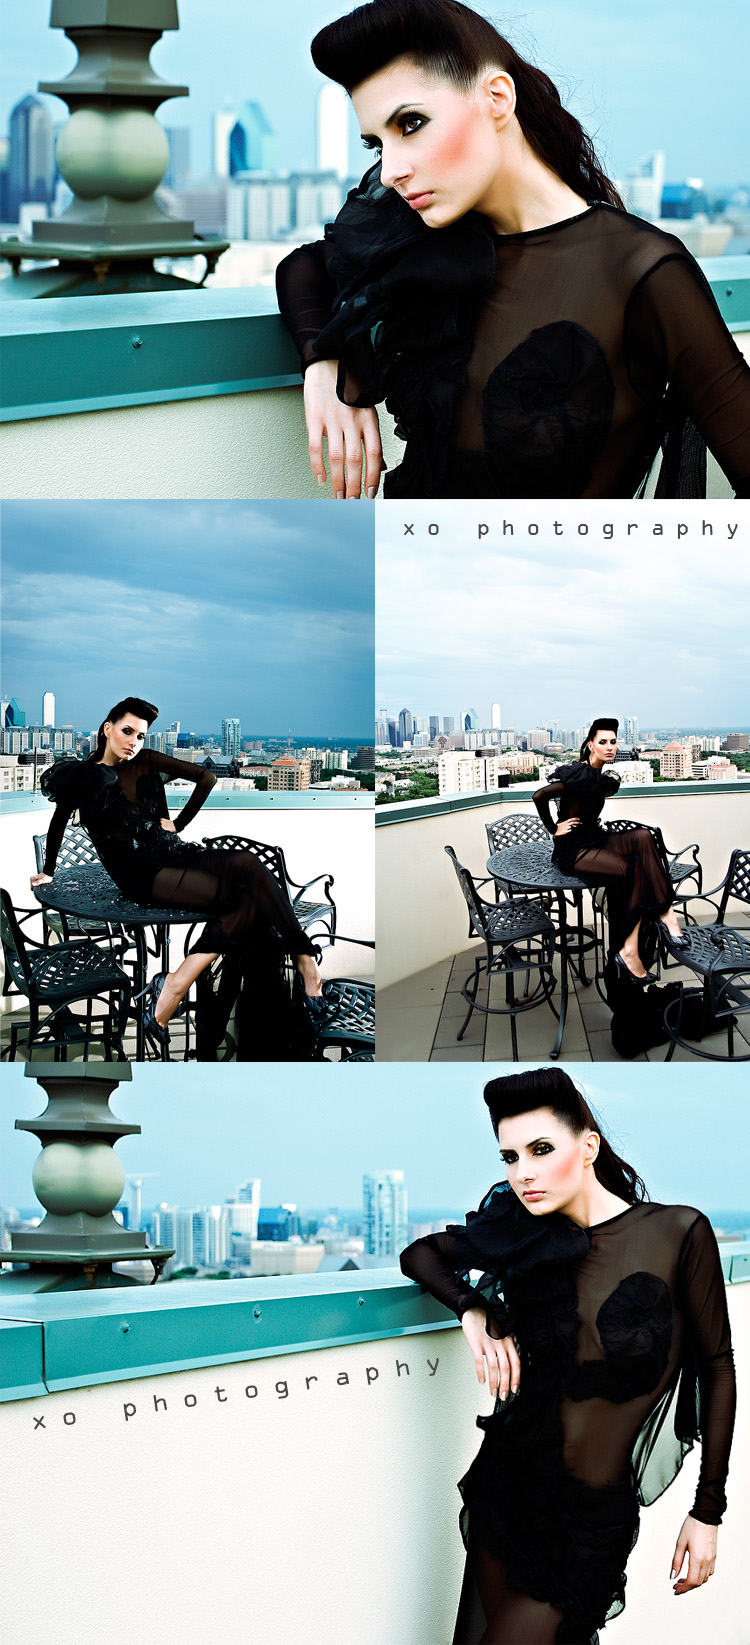 Dallas Jul 18, 2009 QC Cong/XO Photography Model: Olesya G  Wardrobes: Lizzi London Make-up & Hair: Nancy Lam